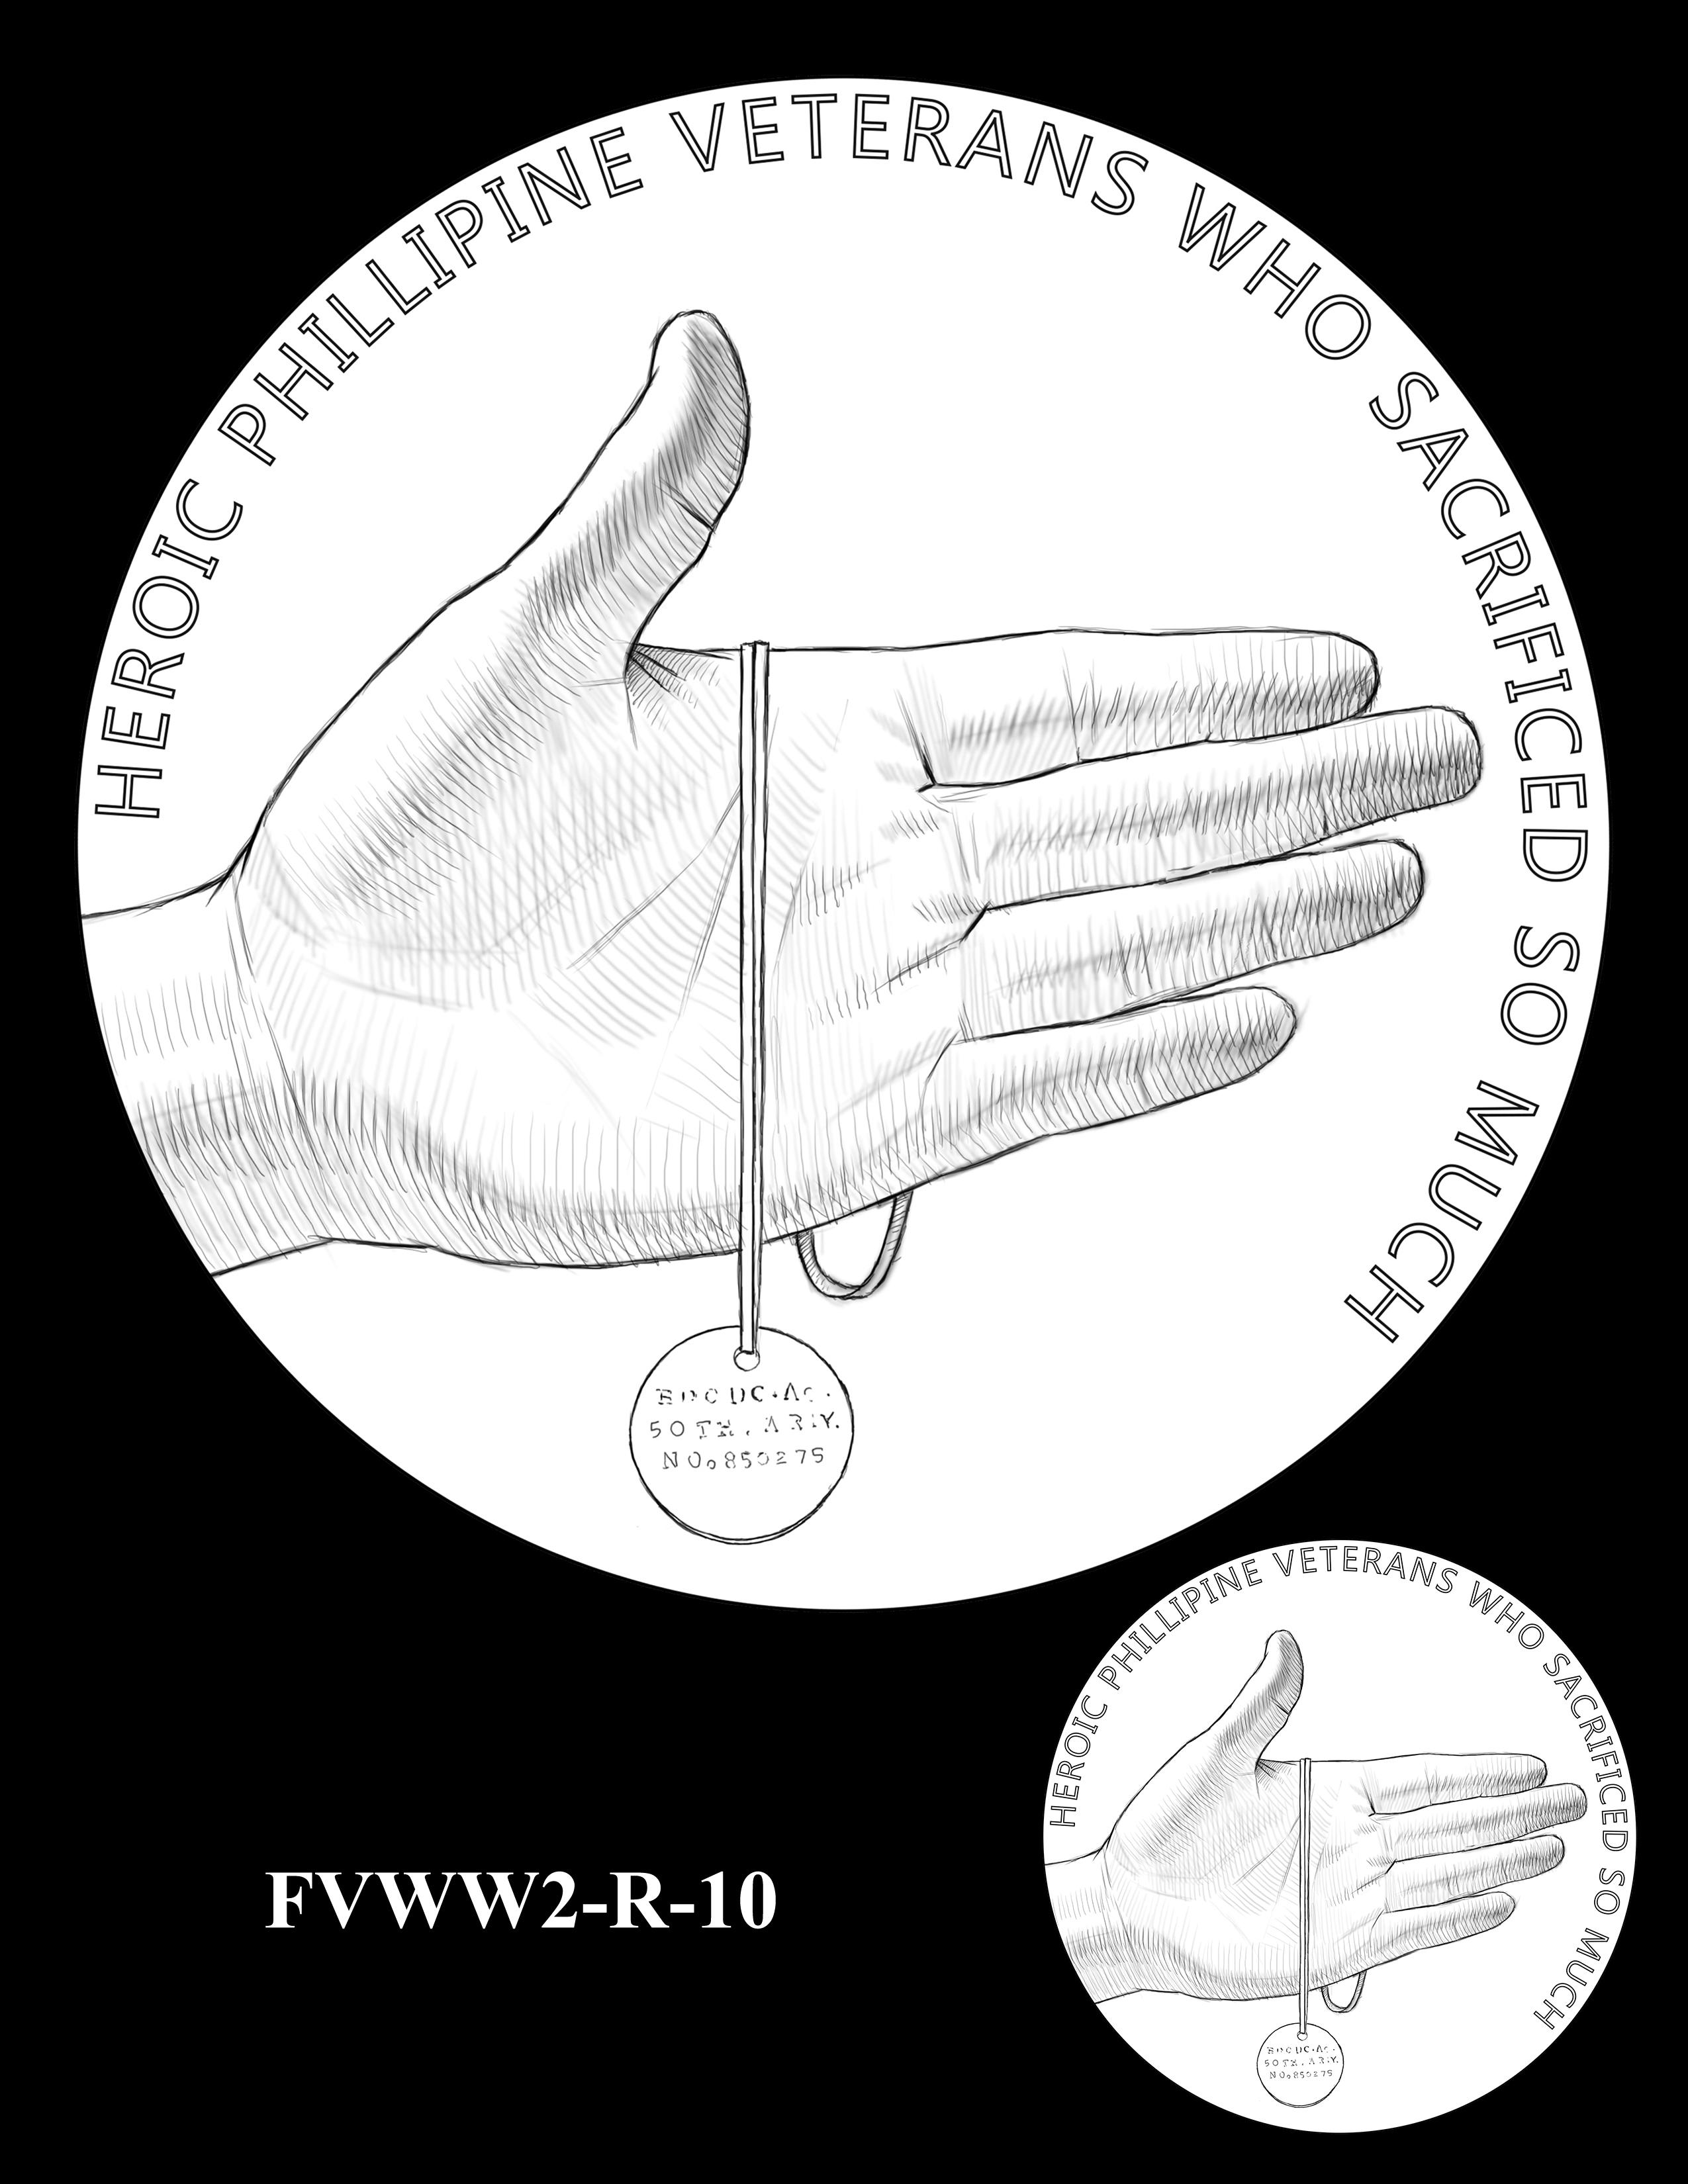 FVWW2-R-10 -- Filipino Veterans of World War II Congressional Gold Medal